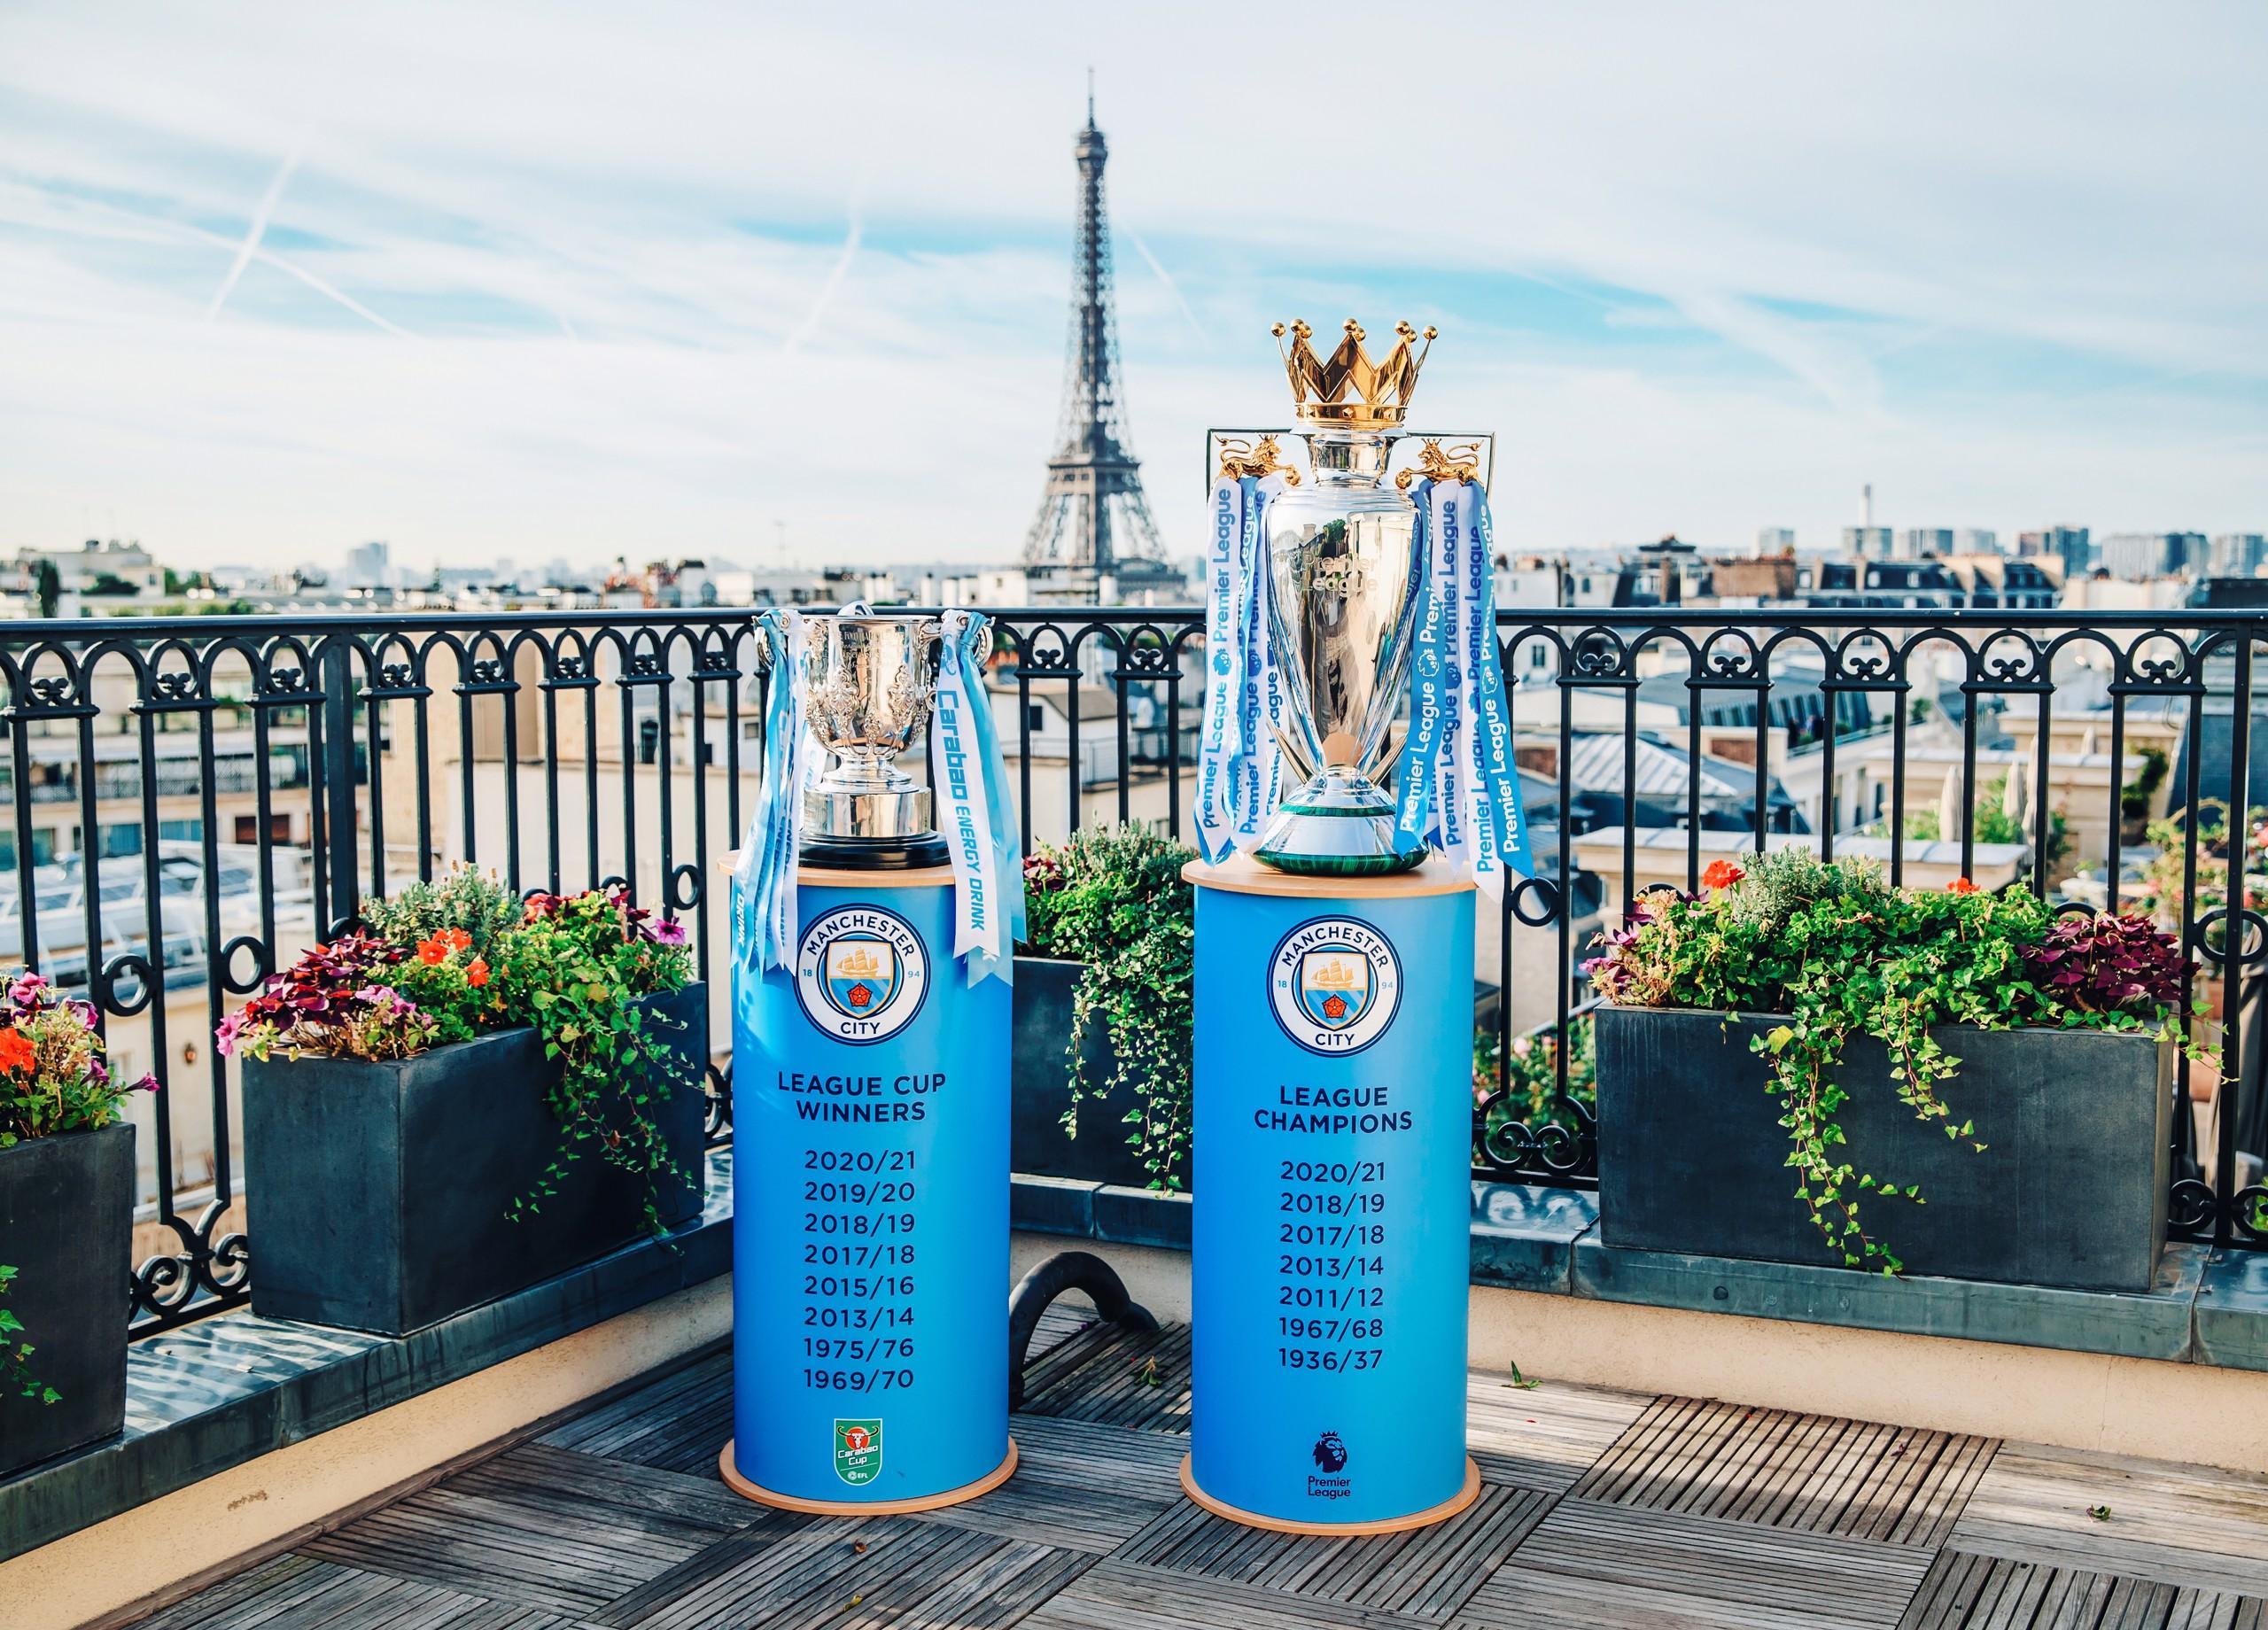 Premier League and Carabao Cup trophies visit France!